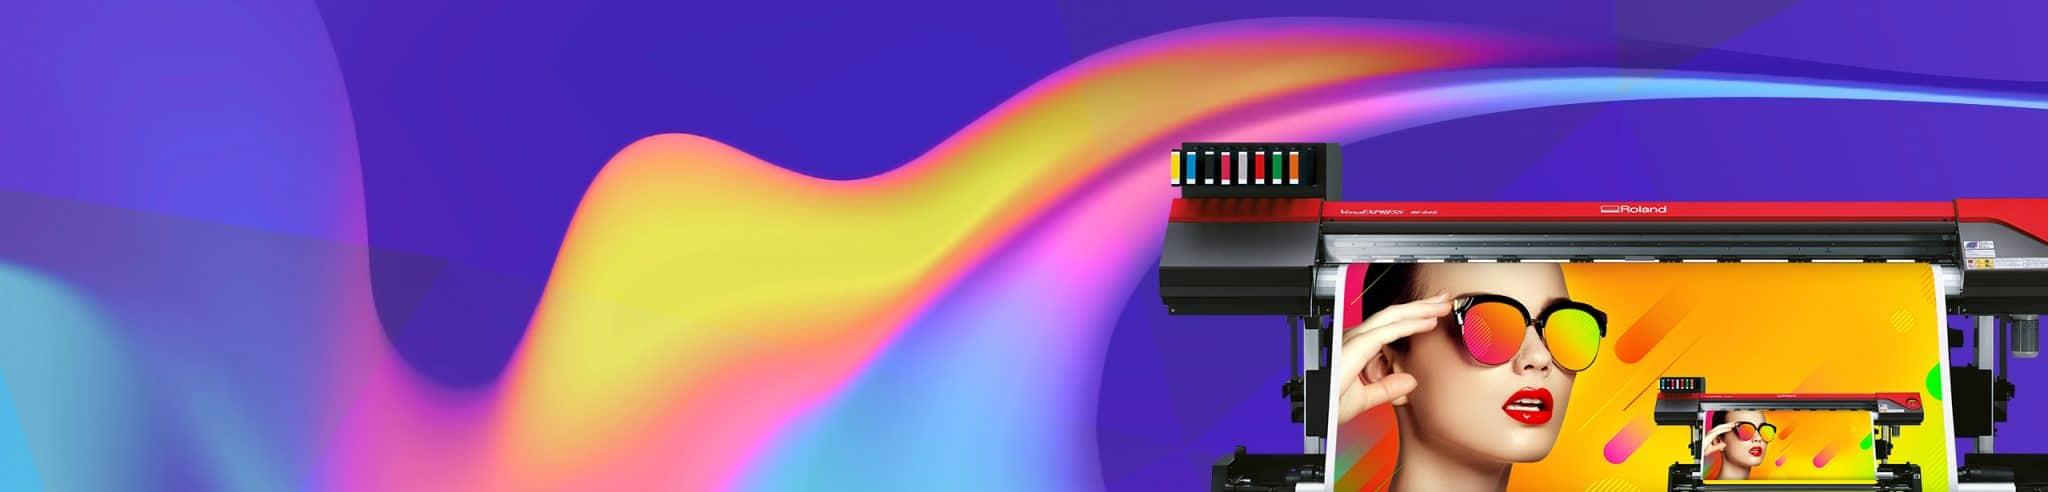 Roland storformatprinter RF-640 8 farver